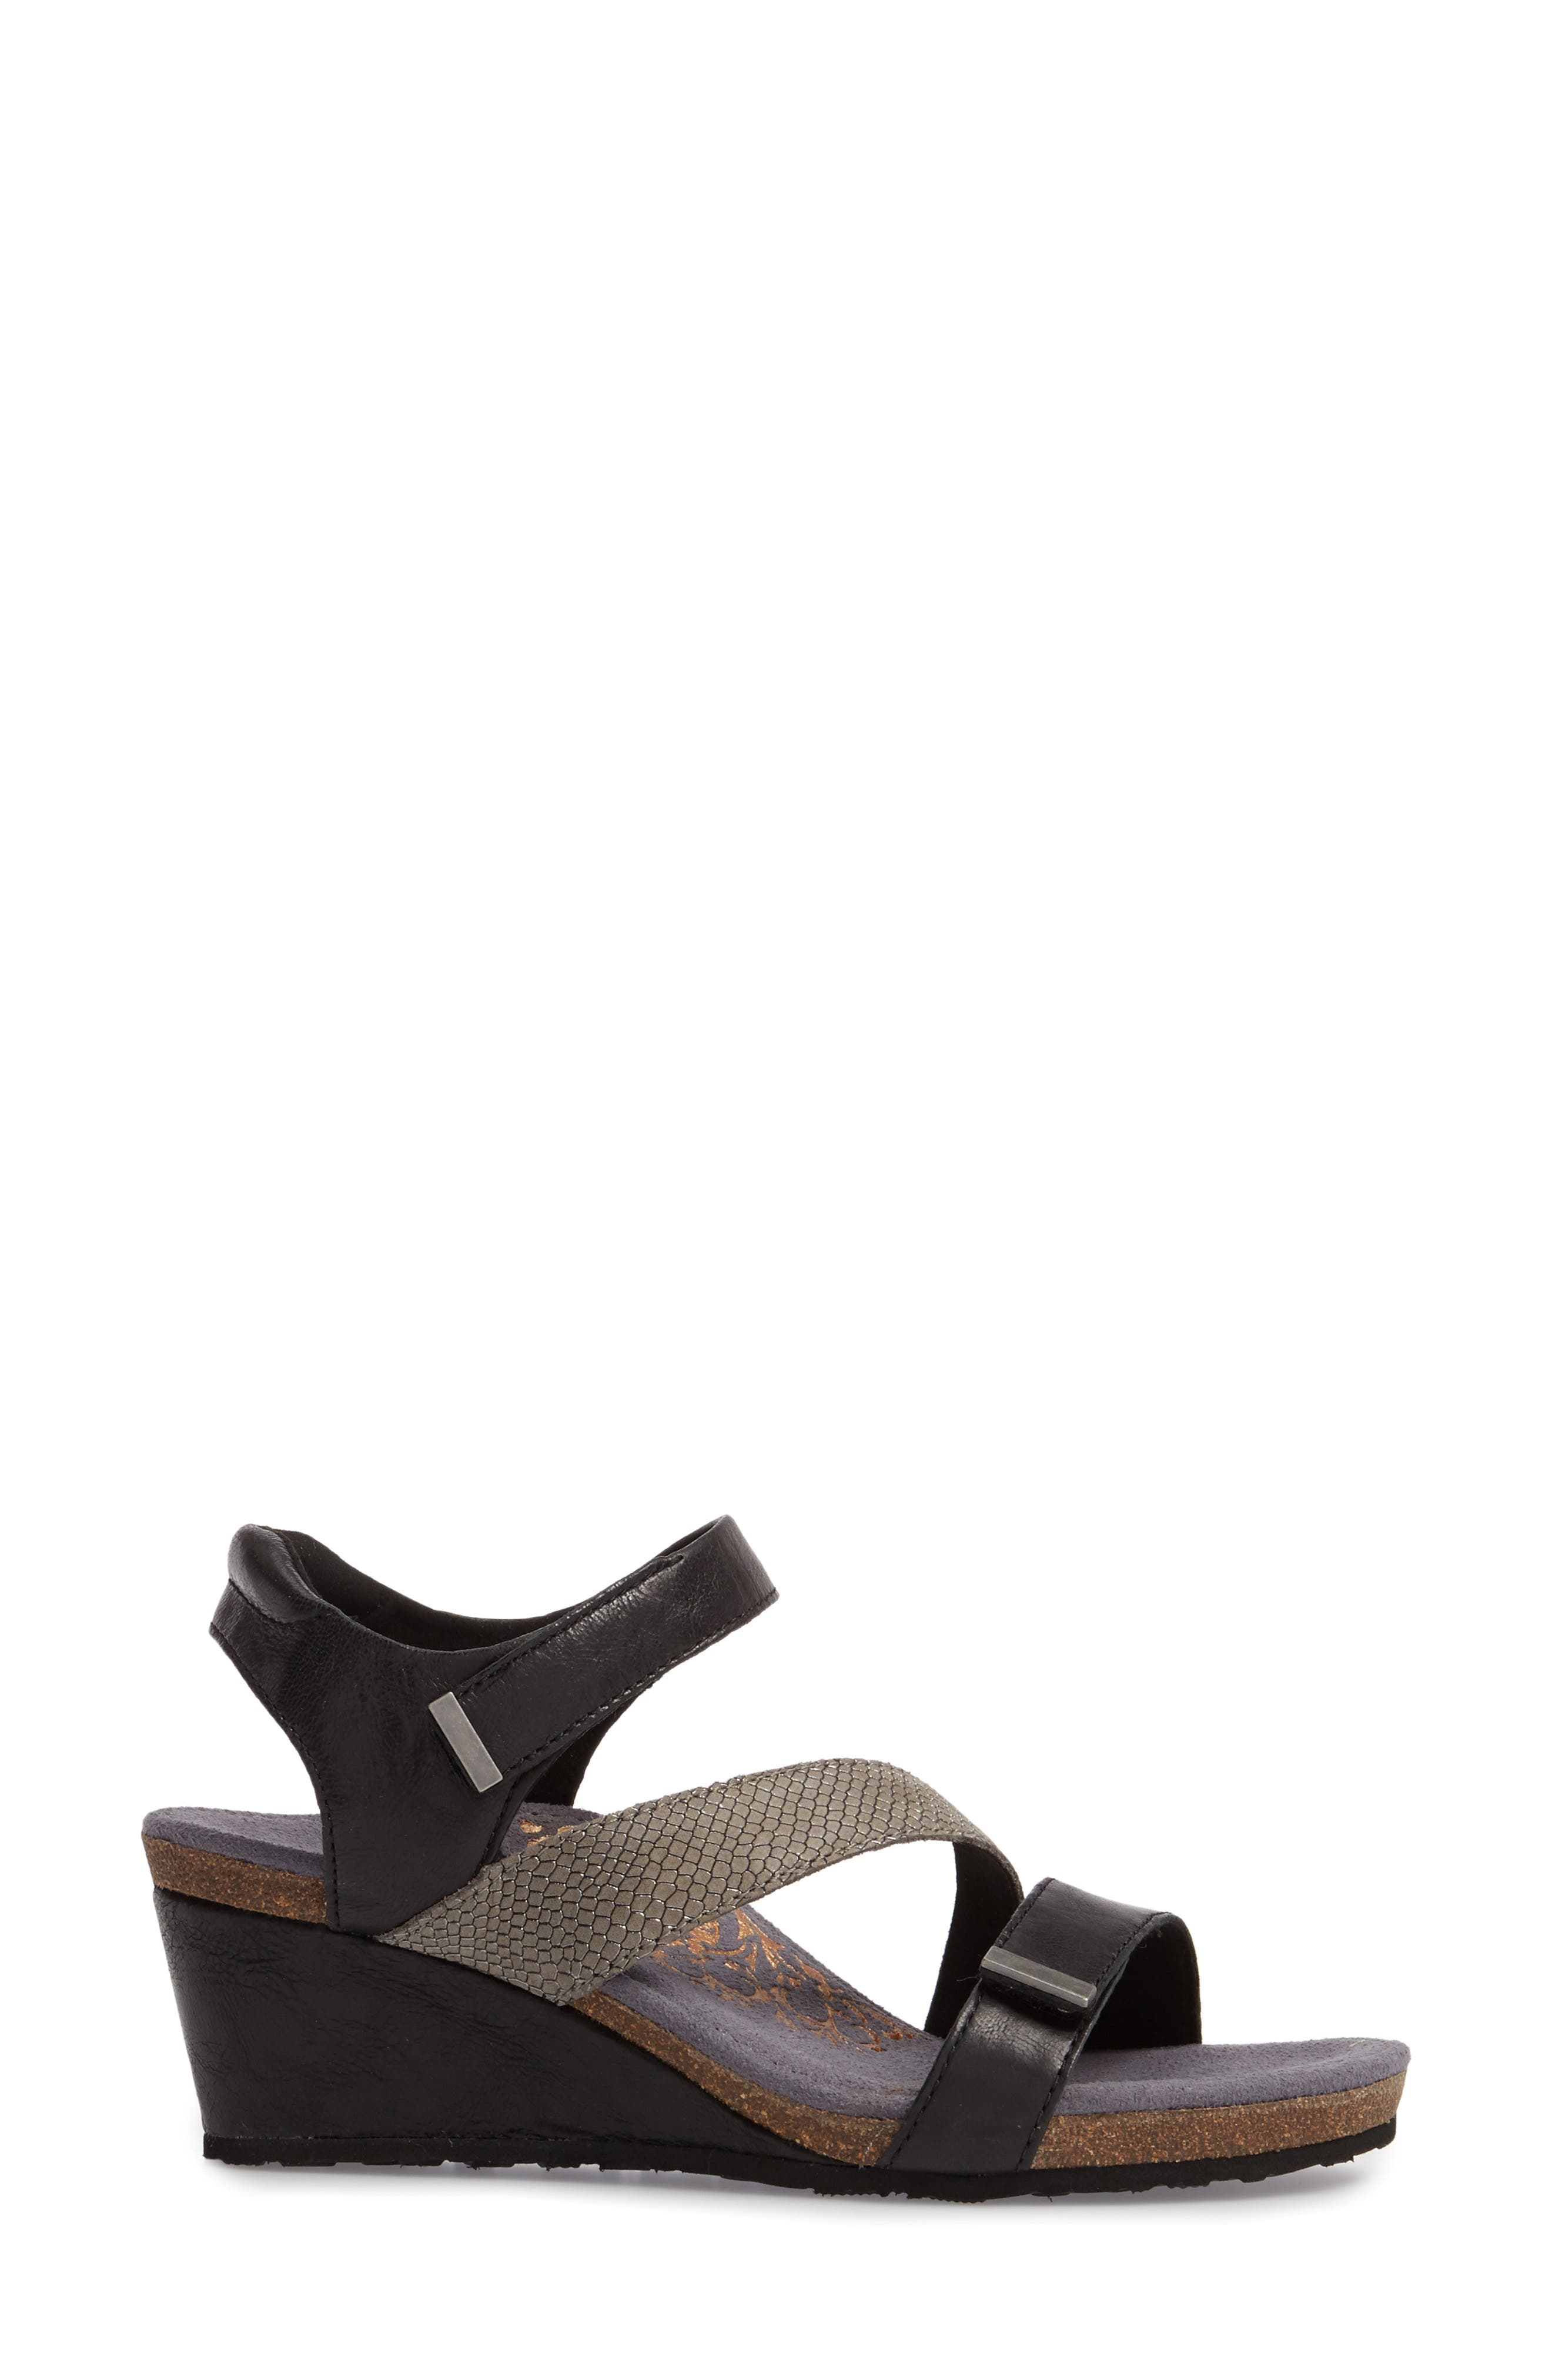 Brynn Asymmetrical Wedge Sandal,                             Alternate thumbnail 3, color,                             Black Leather